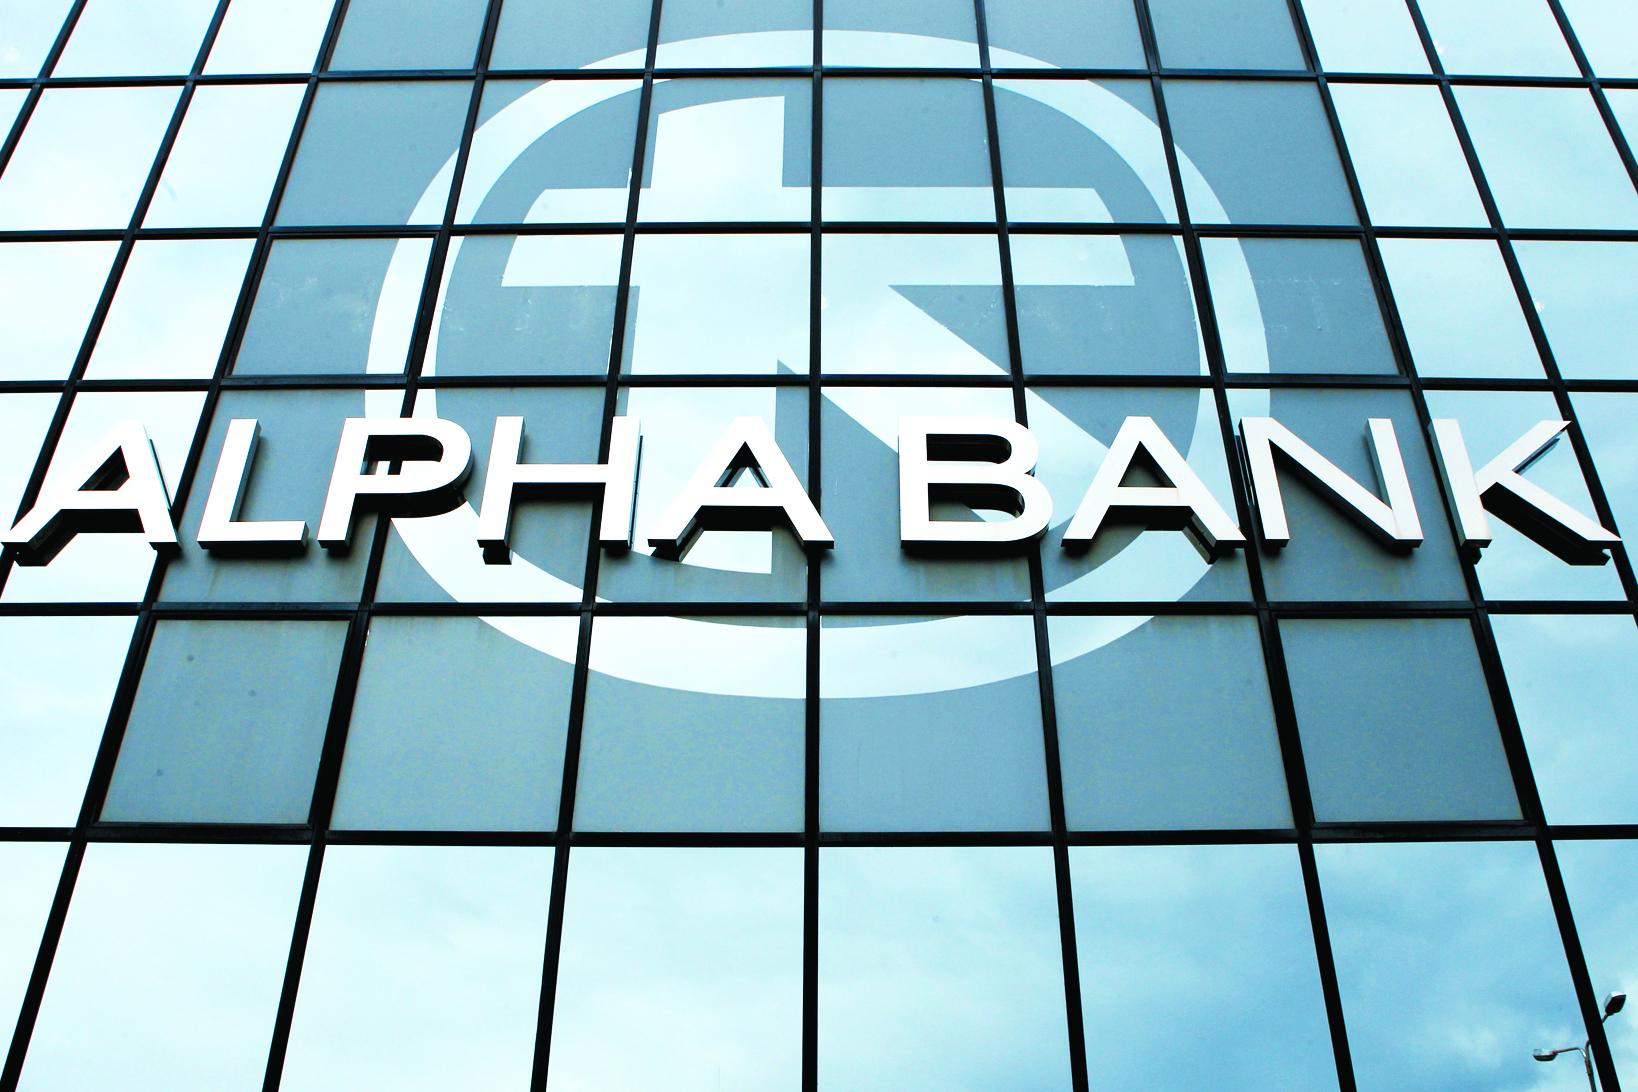 Alpha Bank: Στα 4 δισ. ευρώ το μετοχικό της κεφάλαιο | tovima.gr